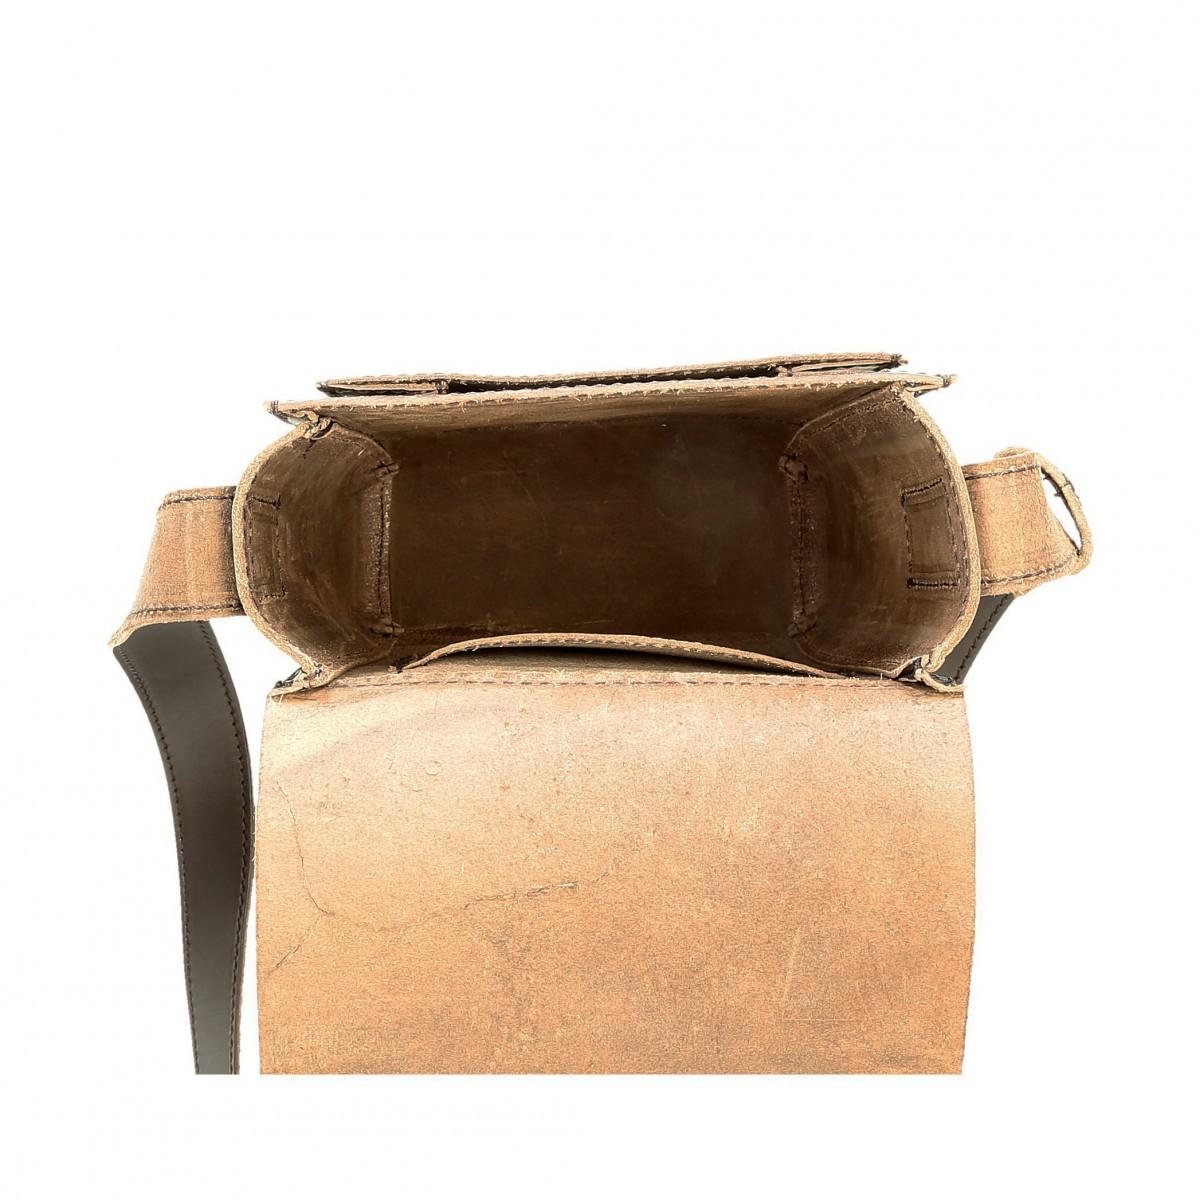 Brown Leather Cross Body Shoulder Bag Handmade Gianluca